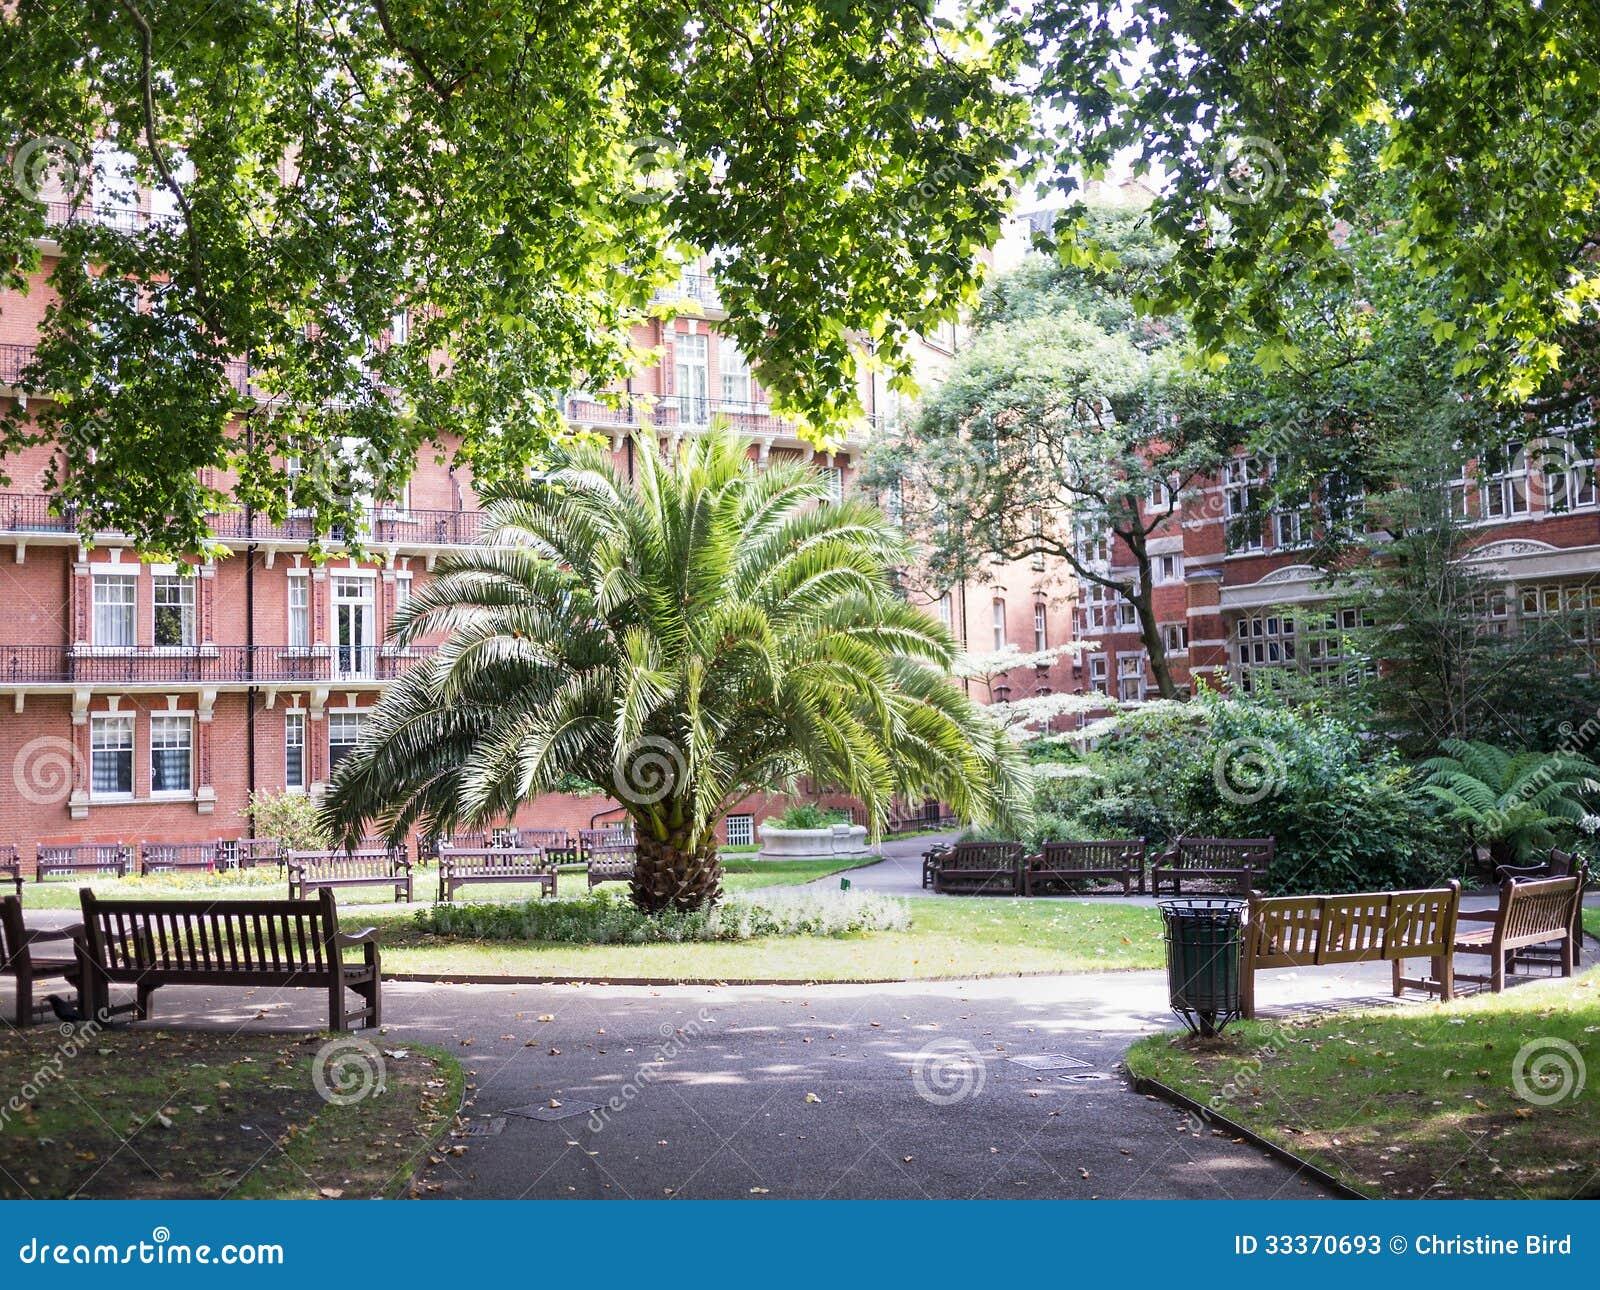 fotos de jardins urbanos : fotos de jardins urbanos:Beautiful Residential Gardens